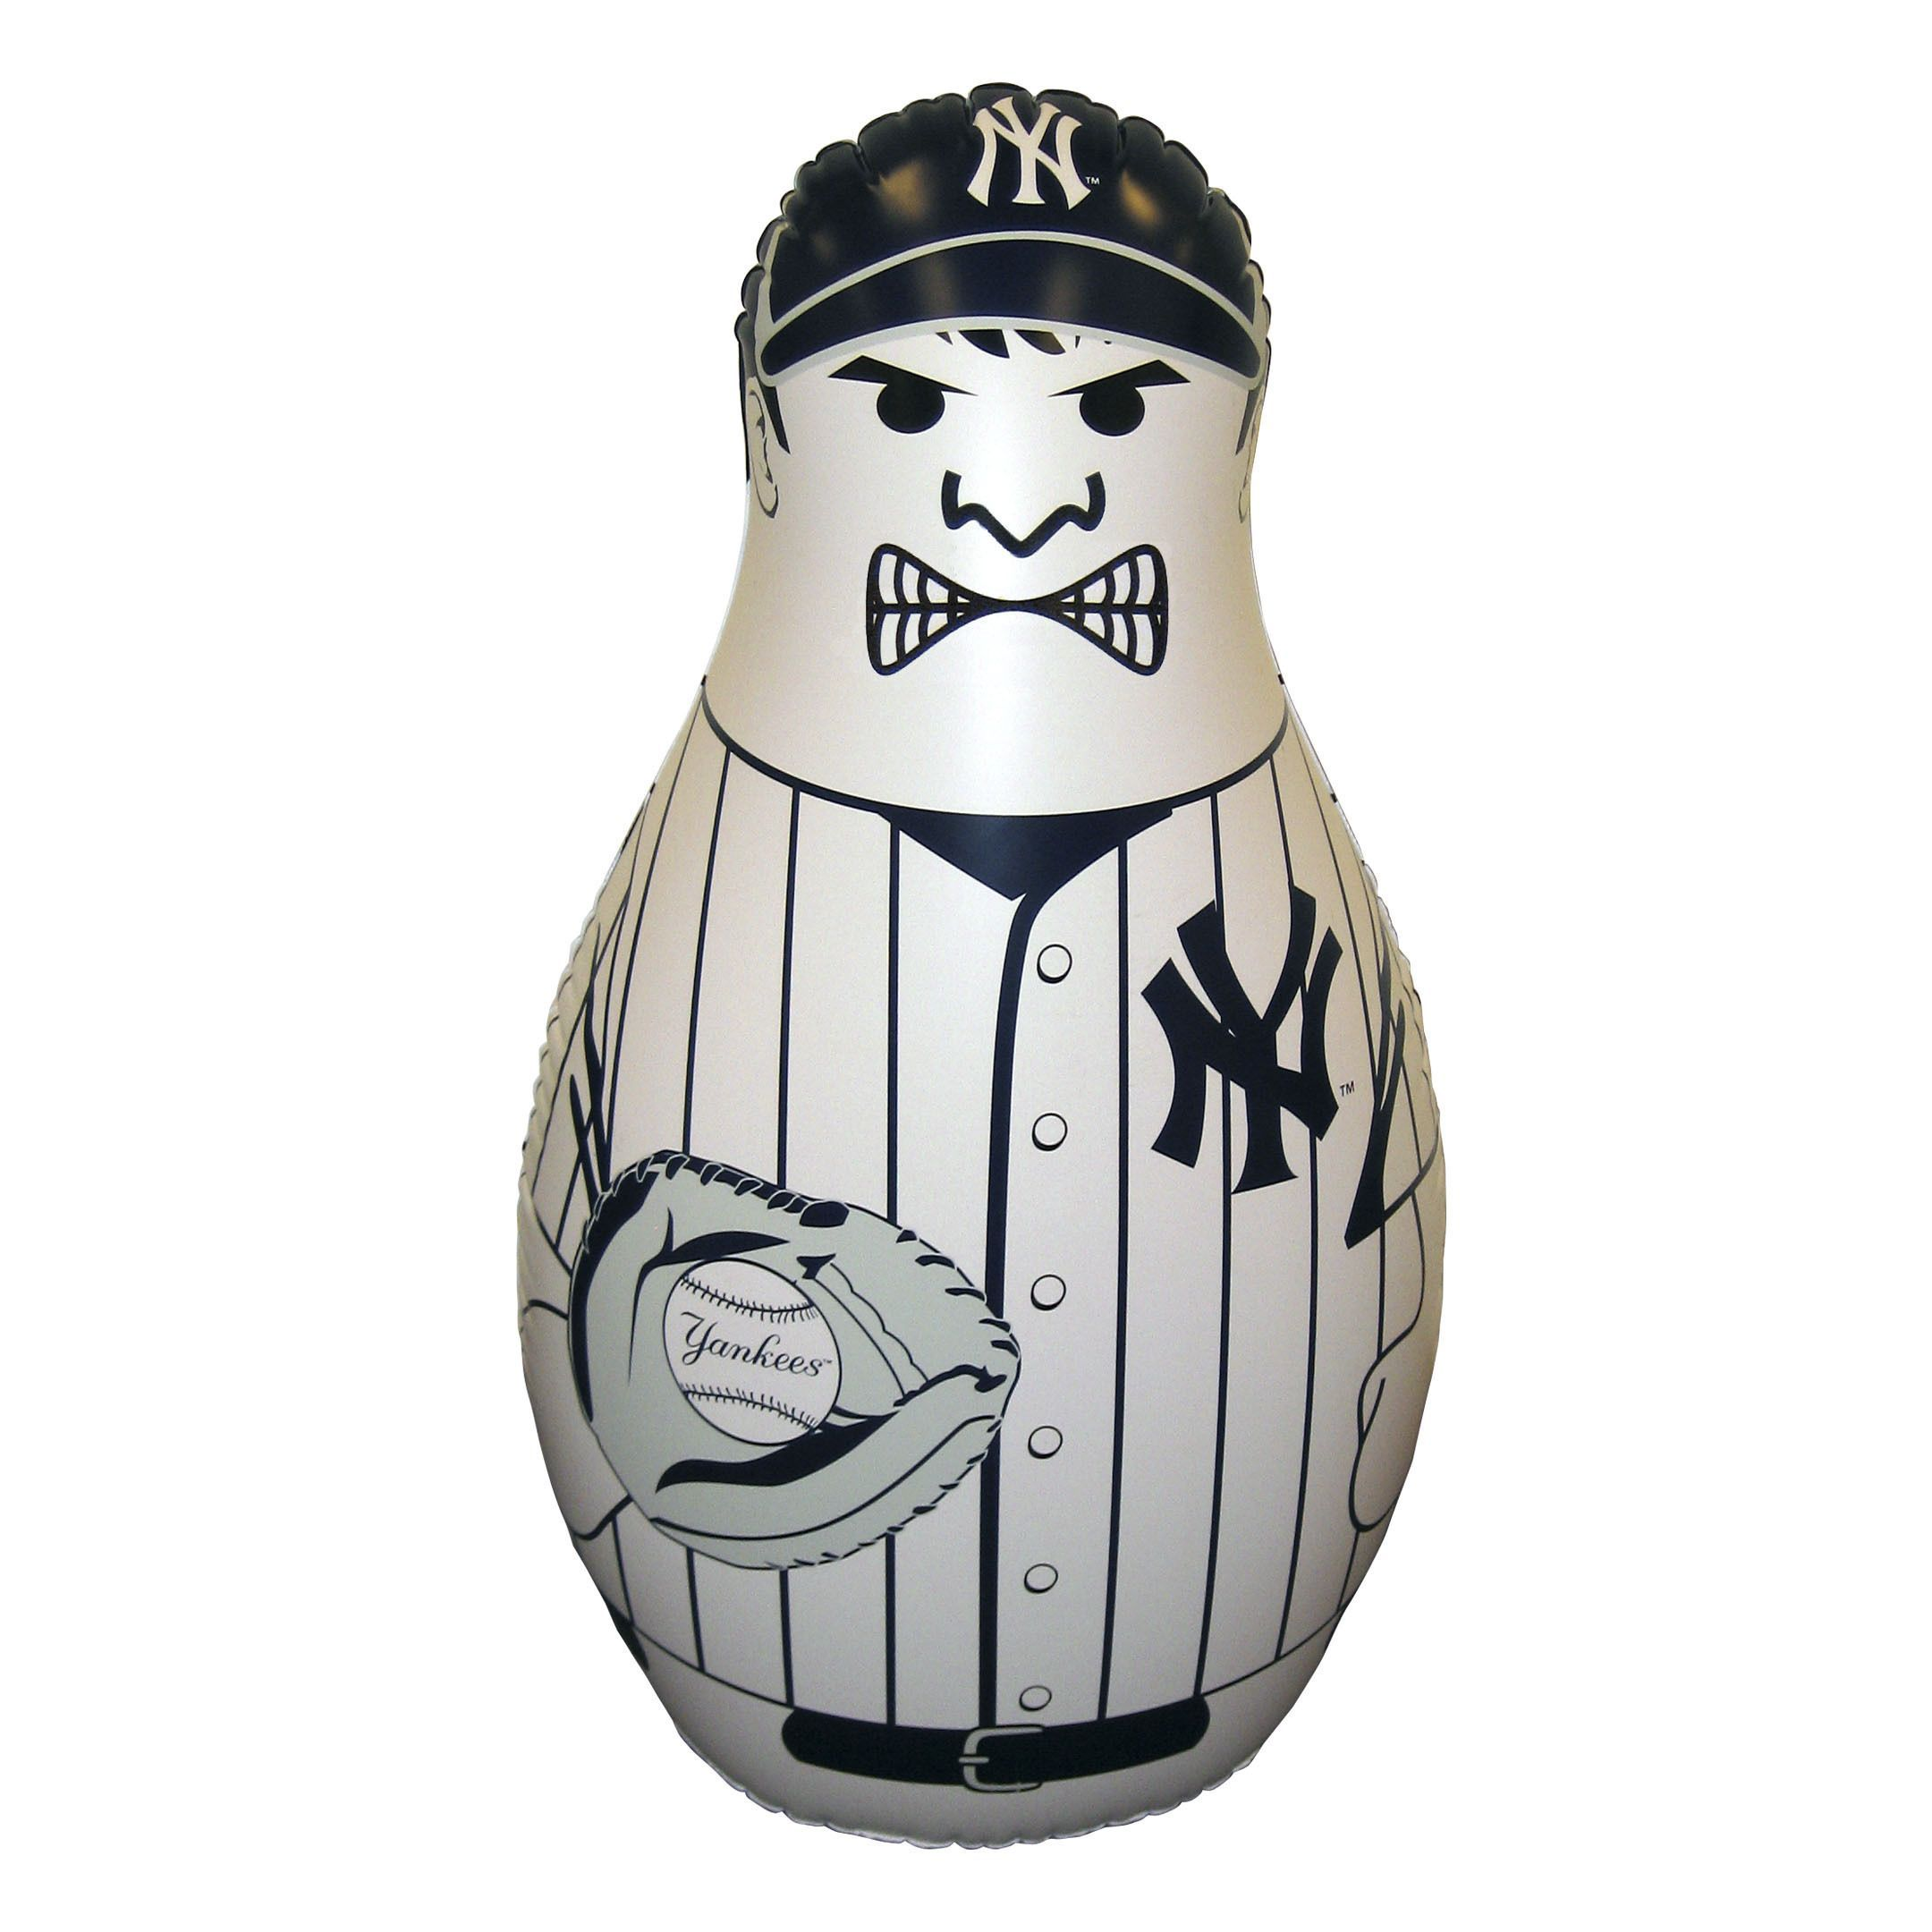 Art Bag Nyc Mlb New York Yankees Bop Bag Inflatable Punching Bag By Fremont Die